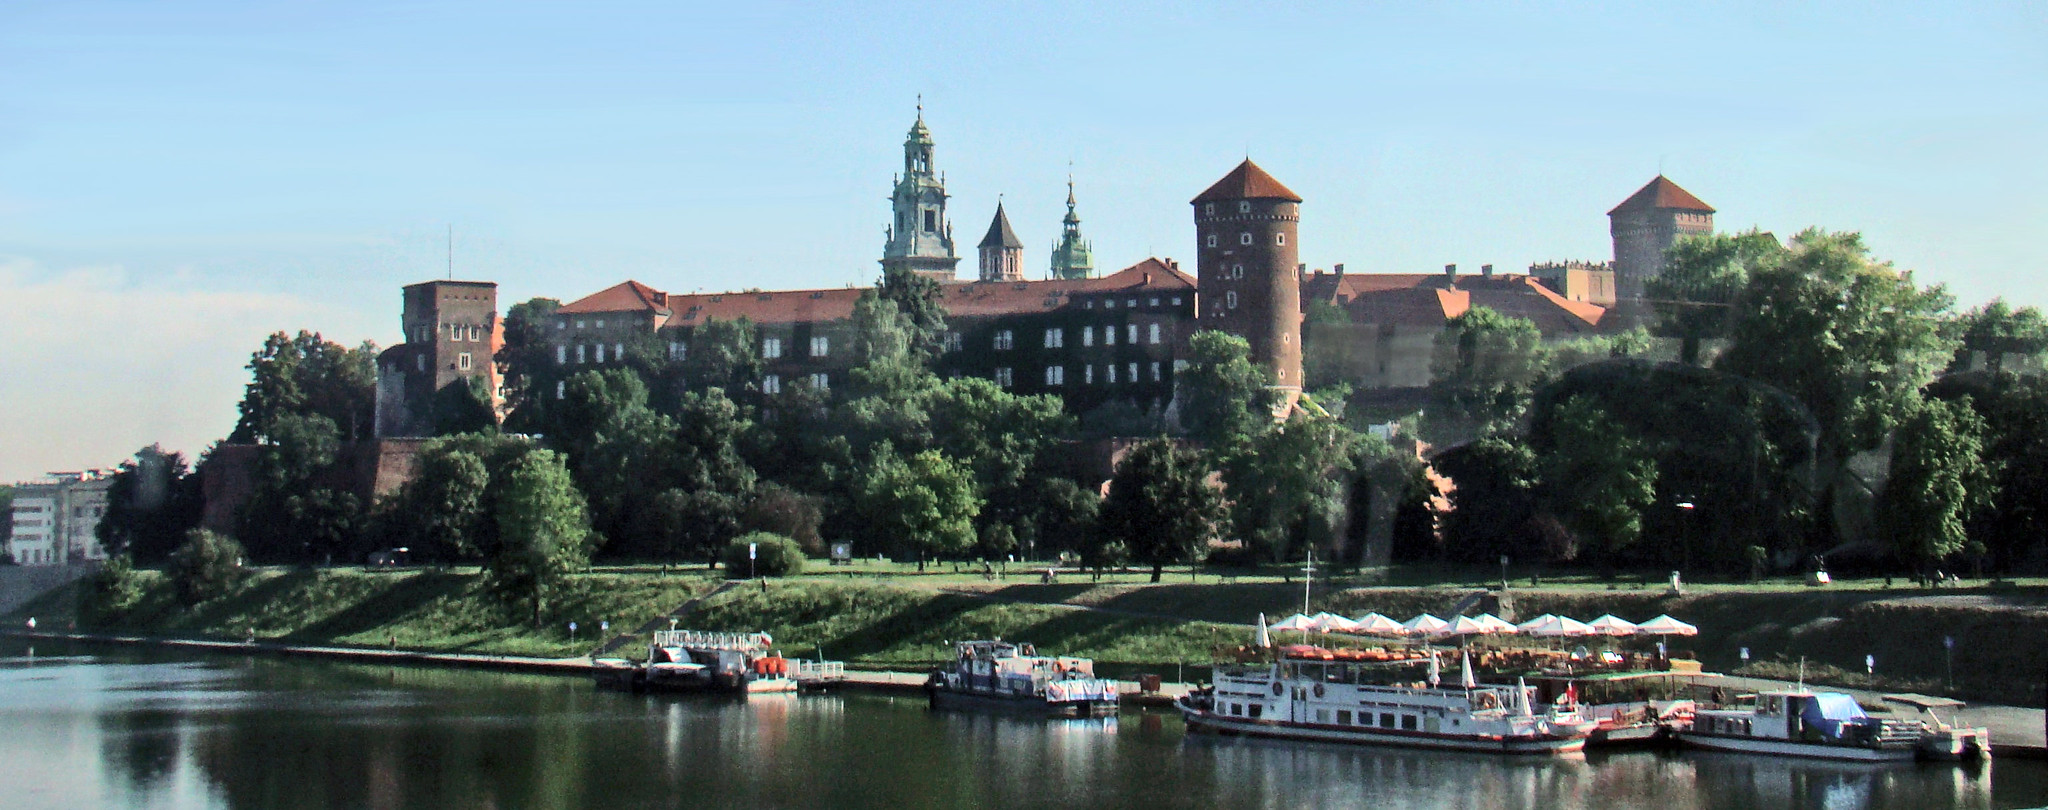 vista exterior Castillo Real de Wawel Cracovia Polonia